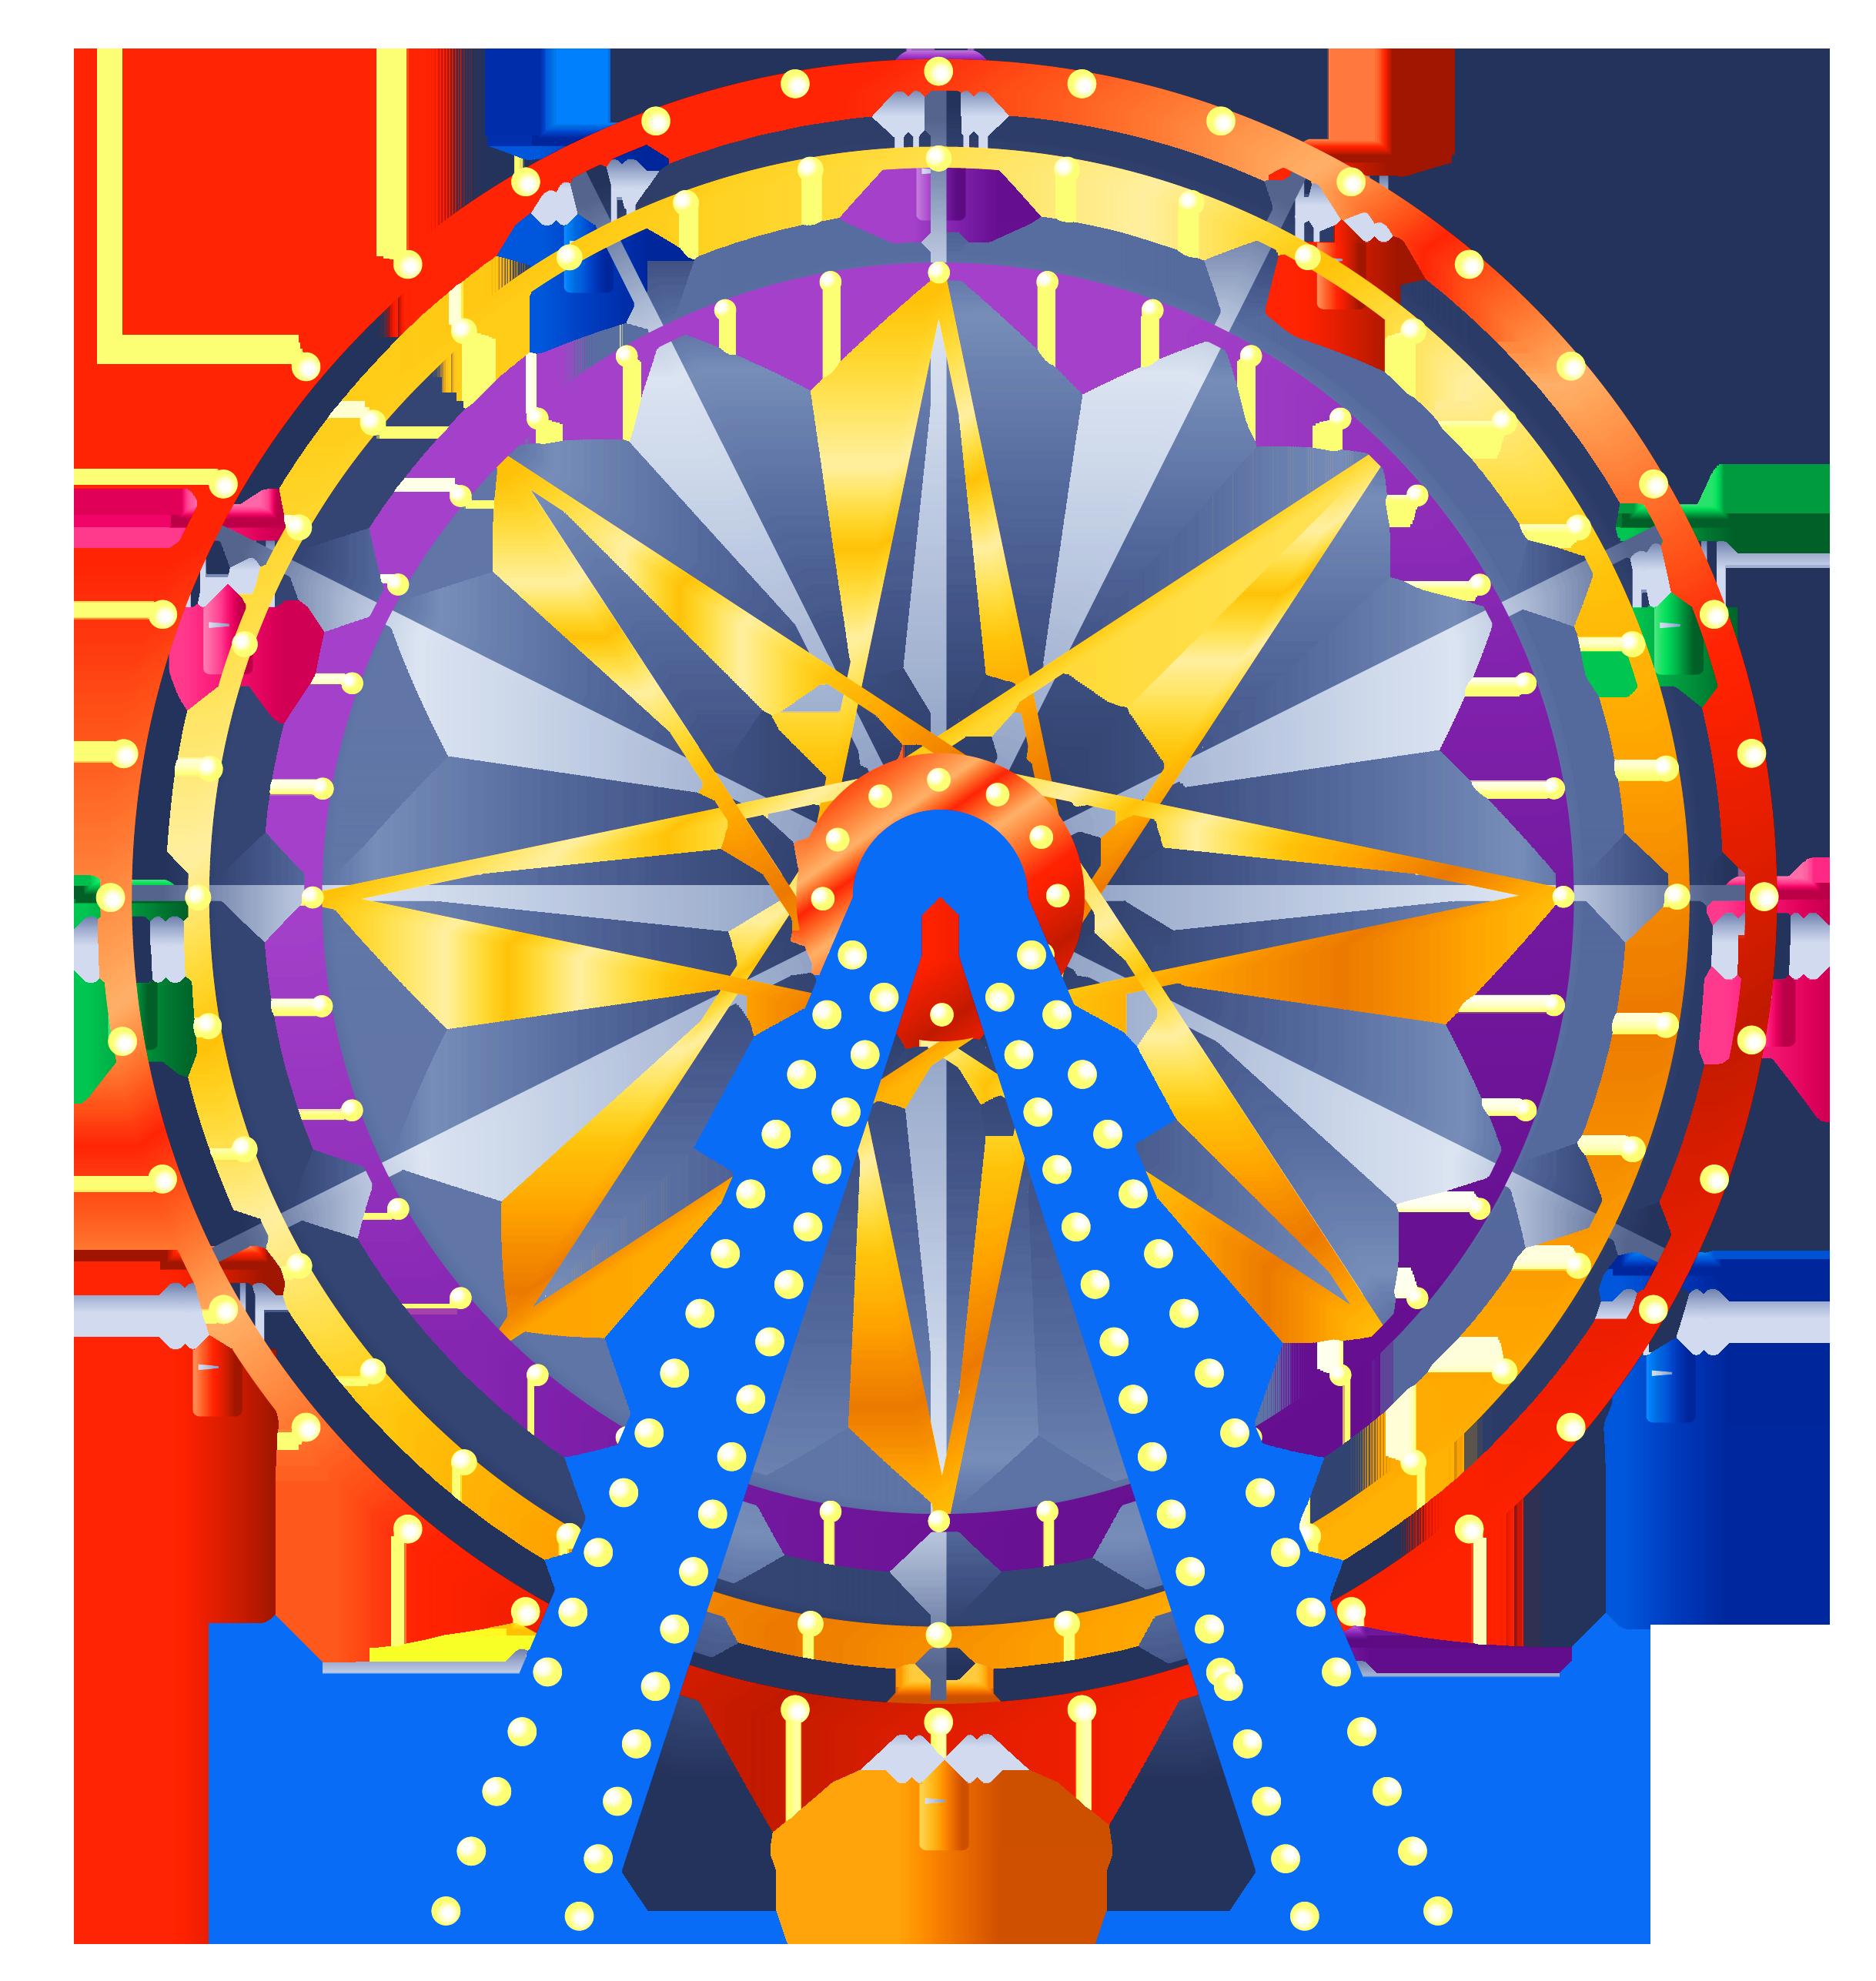 Ferris wheel car clipart image download Ferris Wheel PNG Clip Art - Best WEB Clipart image download